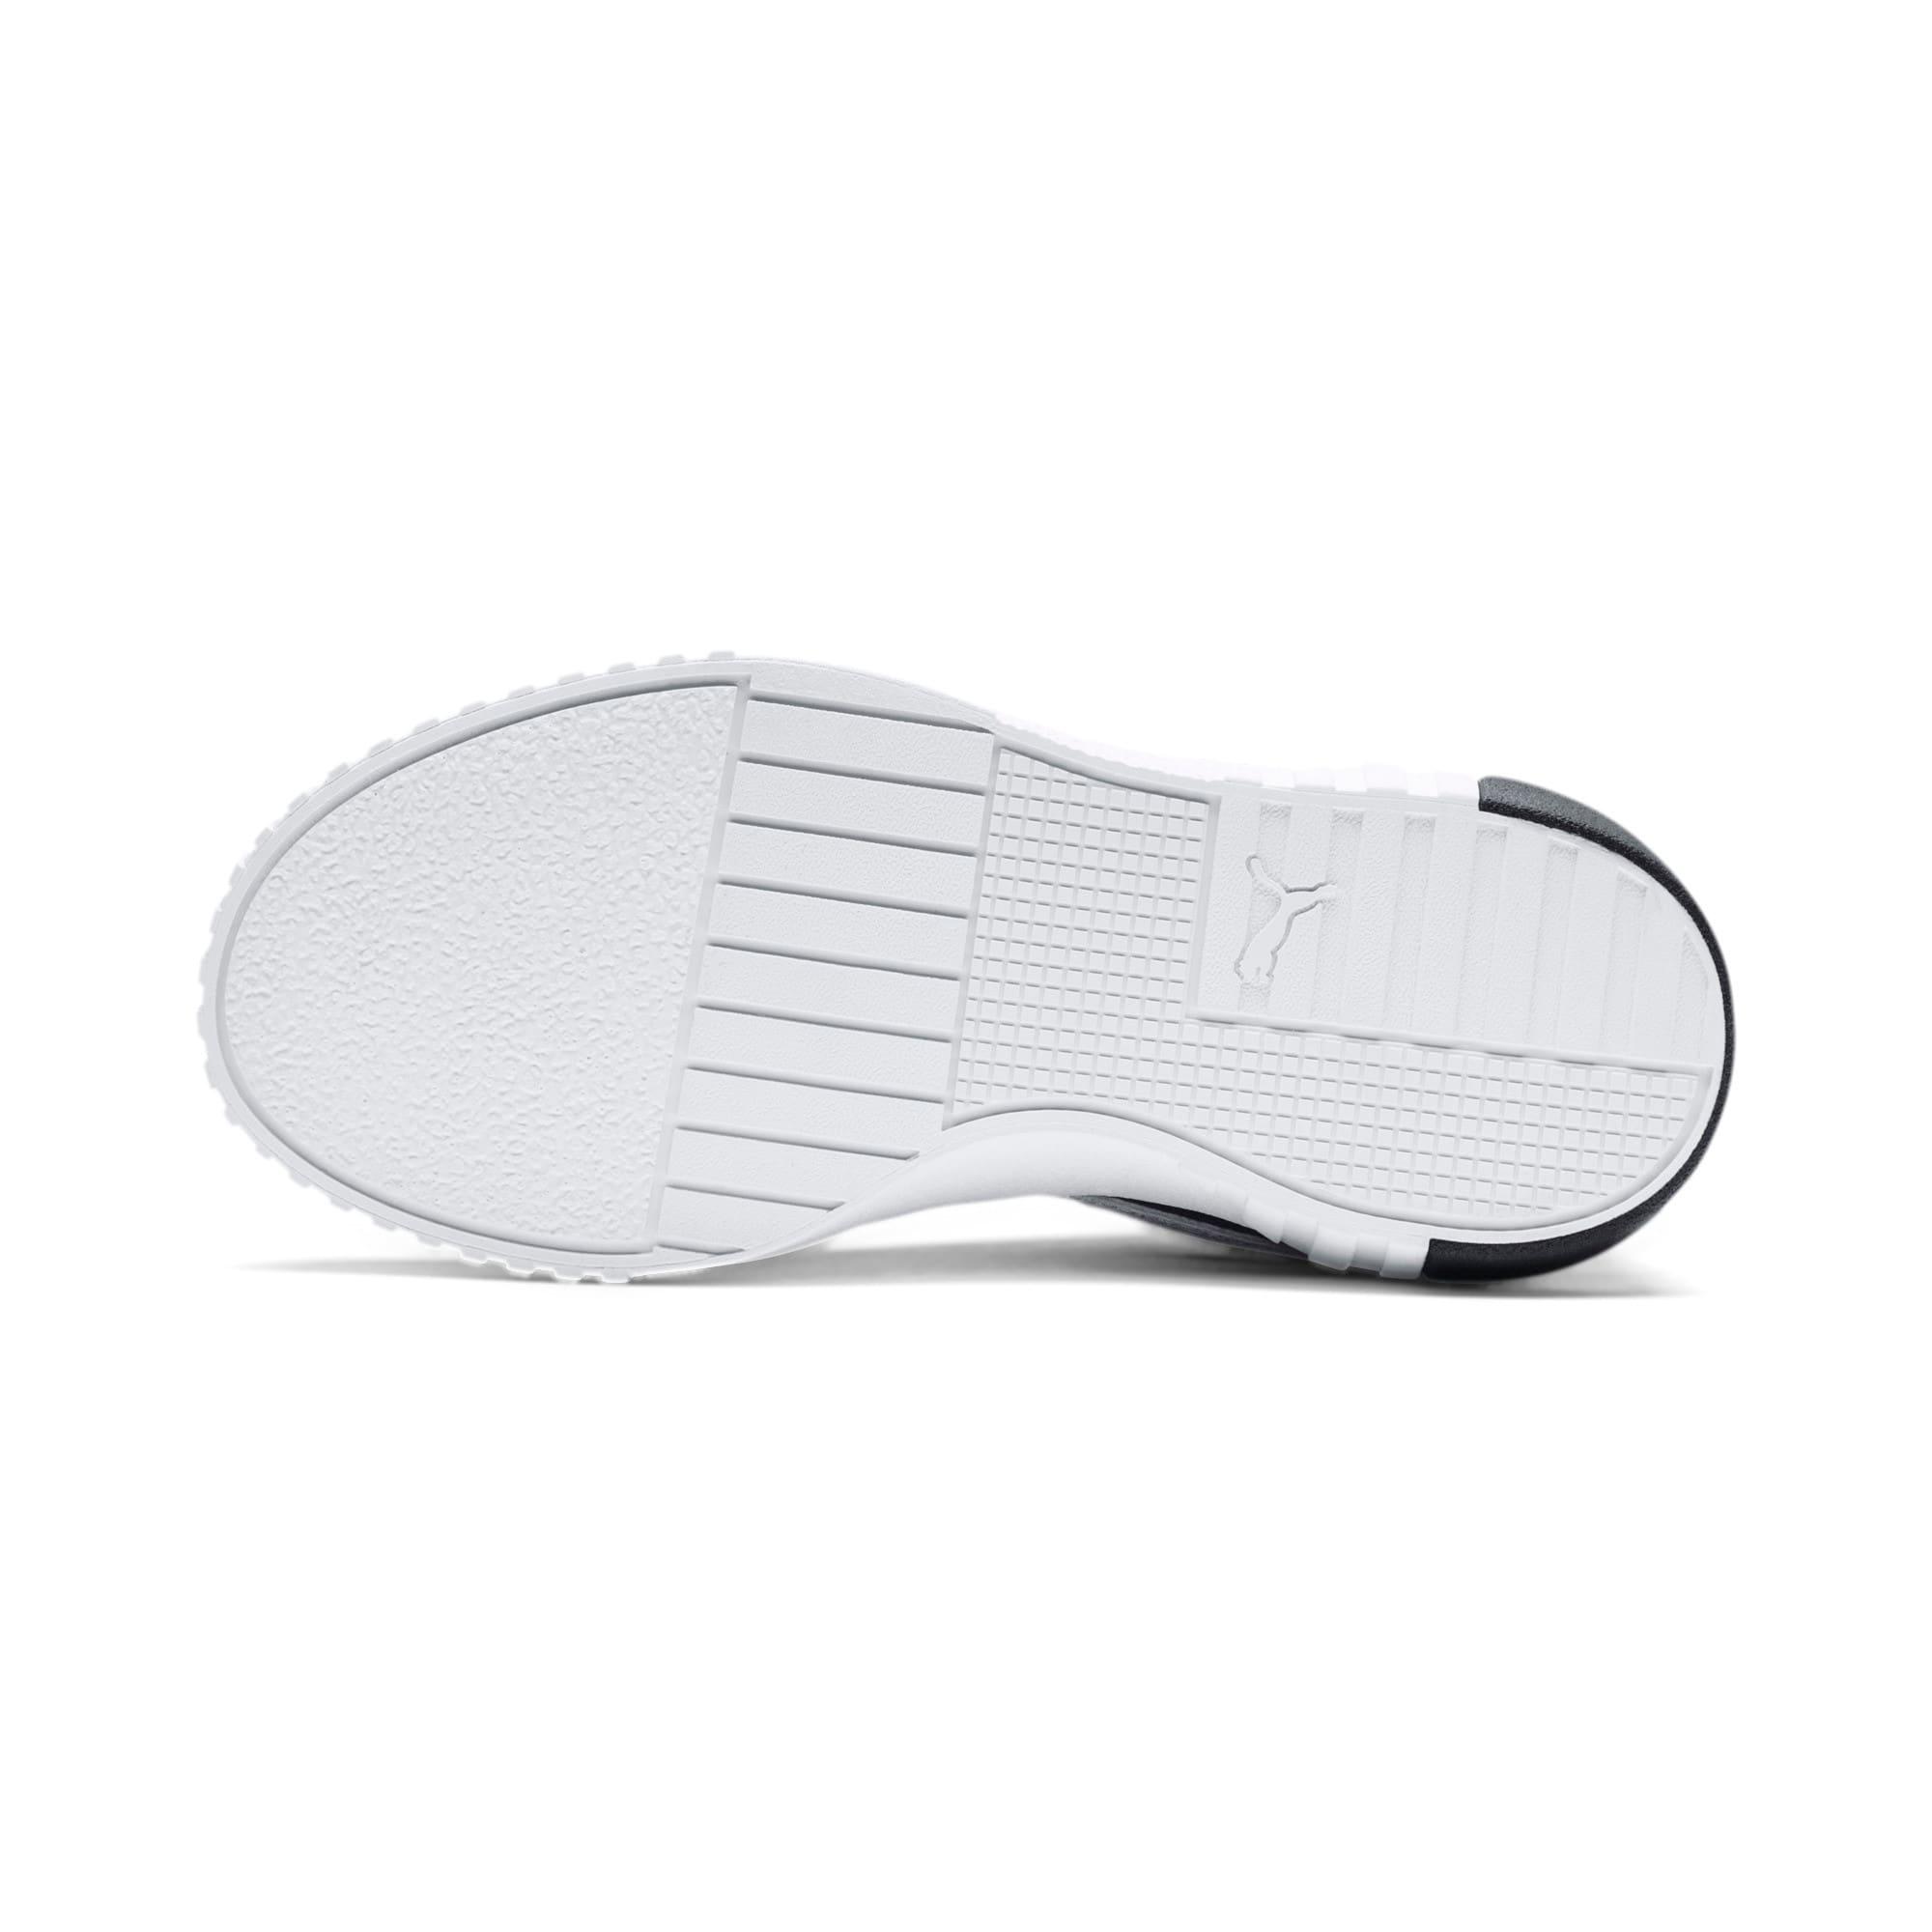 Imagen en miniatura 4 de Zapatillas Cali de niña, Puma Black-Puma Team Gold, mediana